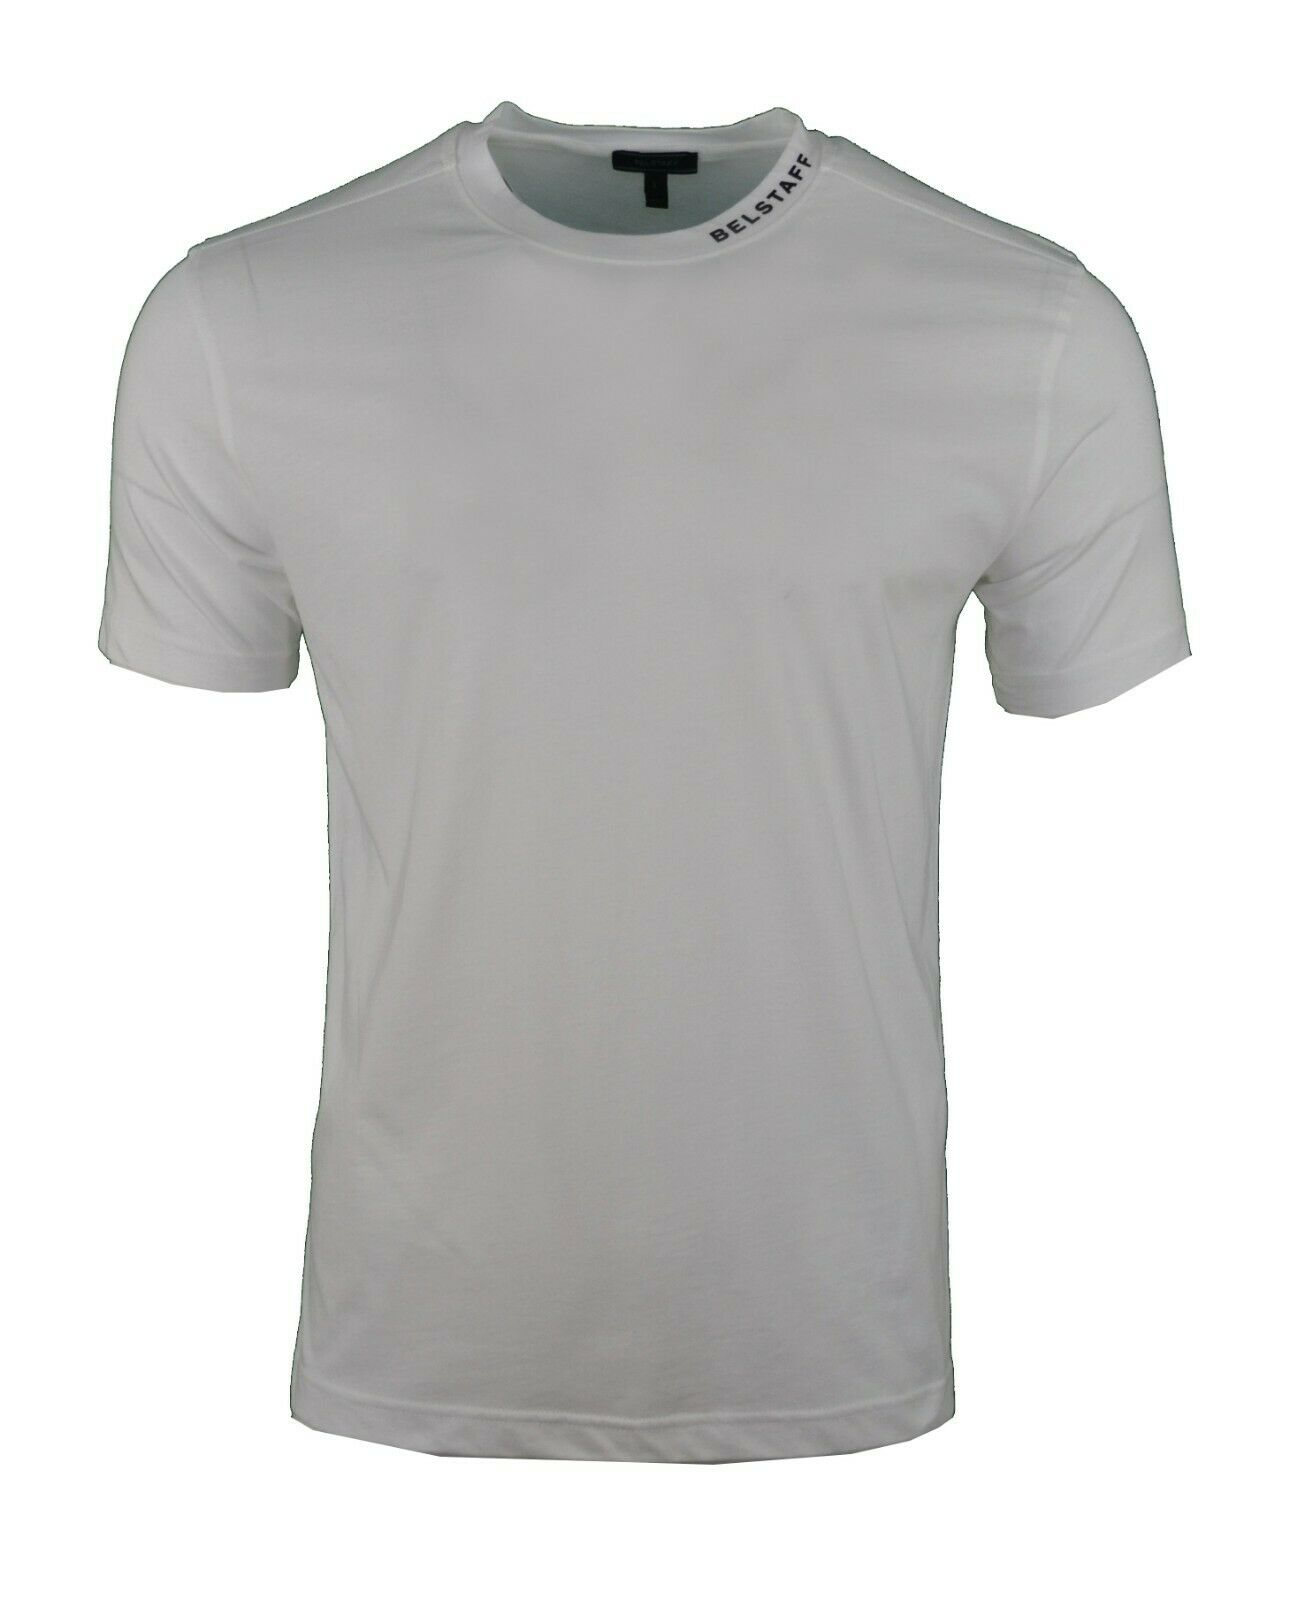 BELSTAFF LONG SLEEVE T-SHIRT TOP THIN SWEATSHIRT RED /& WHITE LOGO PRINT RARE